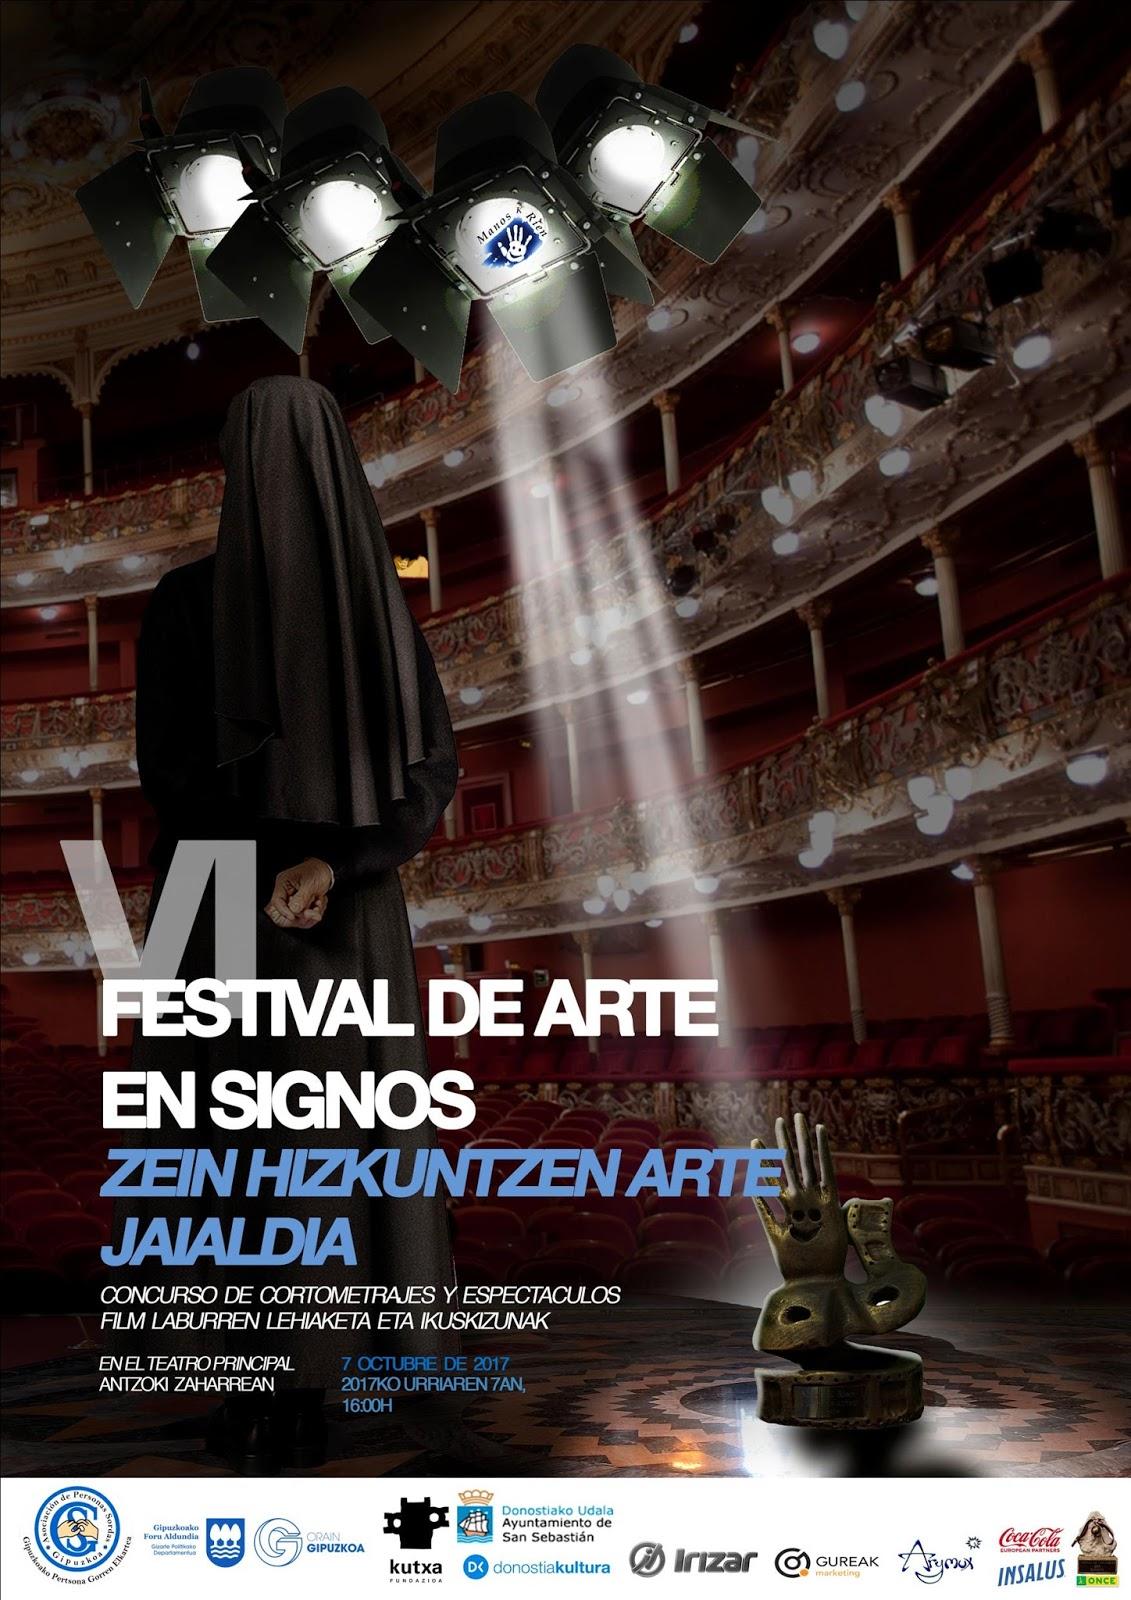 VI Festival de Arte en Signos - San Sebastián, 7 oct.'17 Caretl%2Bfestival%2B2017